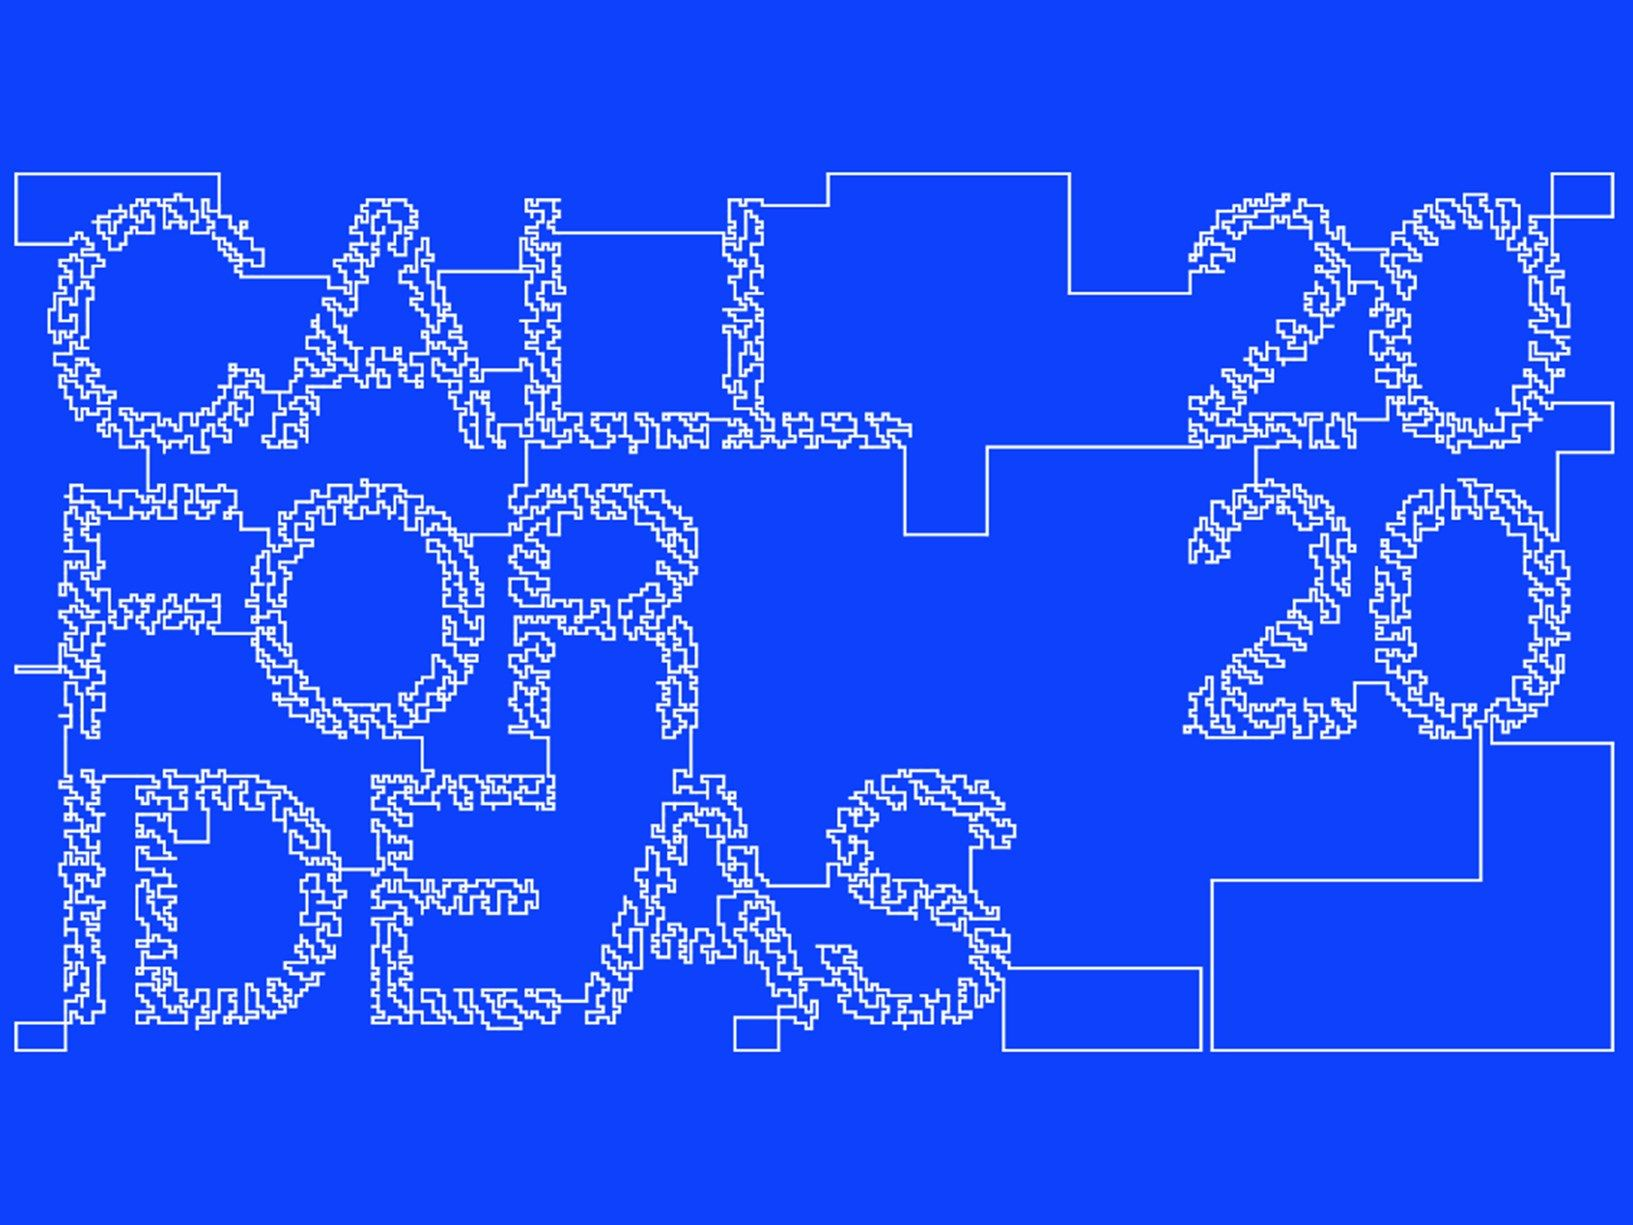 2020 Call for Ideas